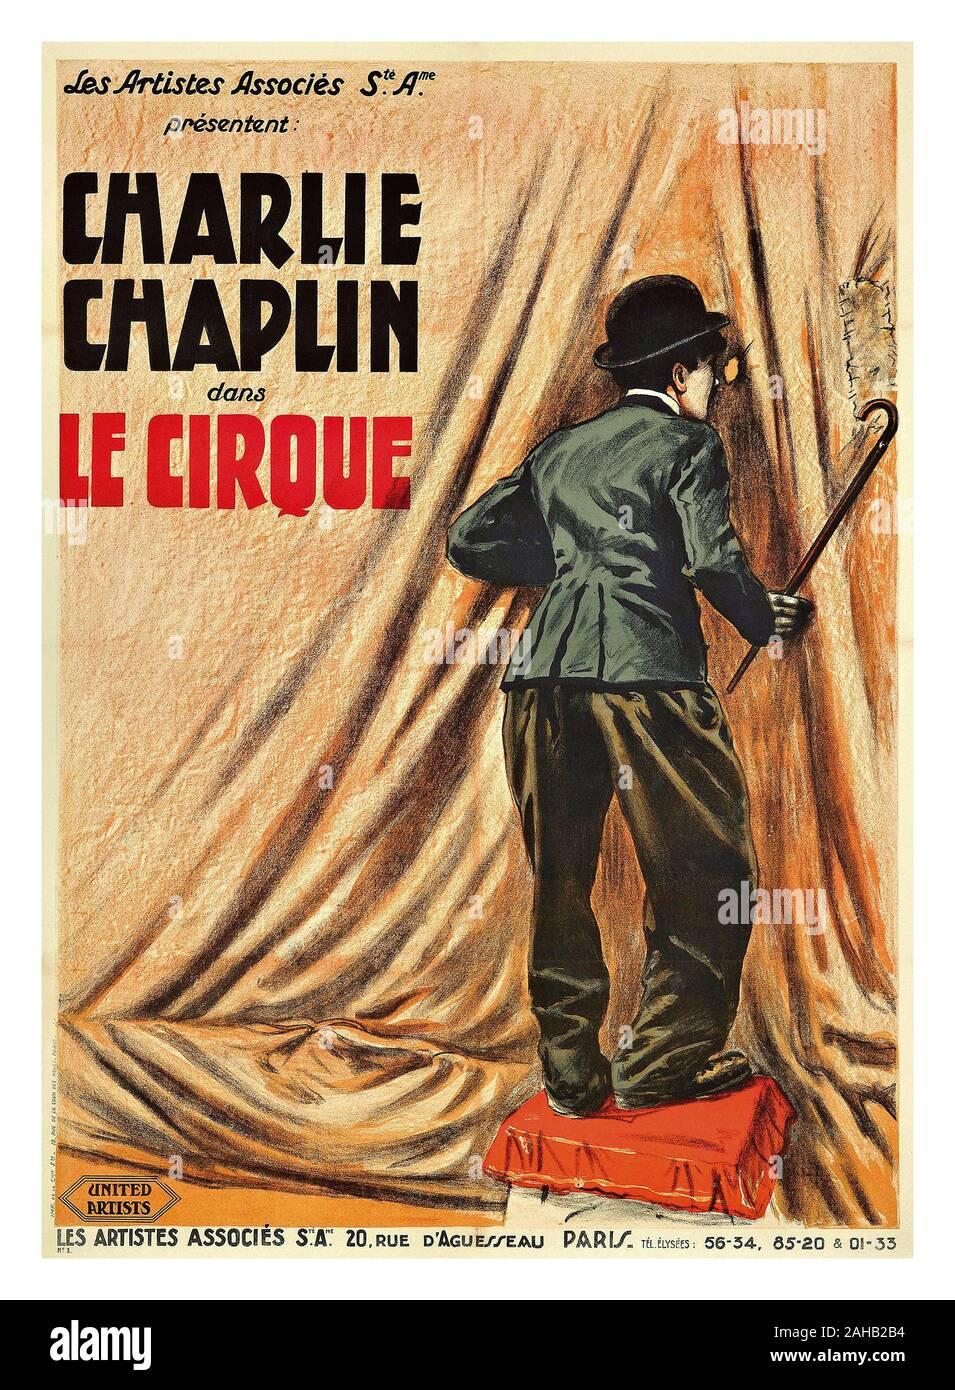 Le Cirque (film) : cirque, (film), Vintage, 1920's, Movie, Poster, Charlie, Chaplin, Cirque', CIRCUS, Tramp, French, Muet,, Drame,, Romance